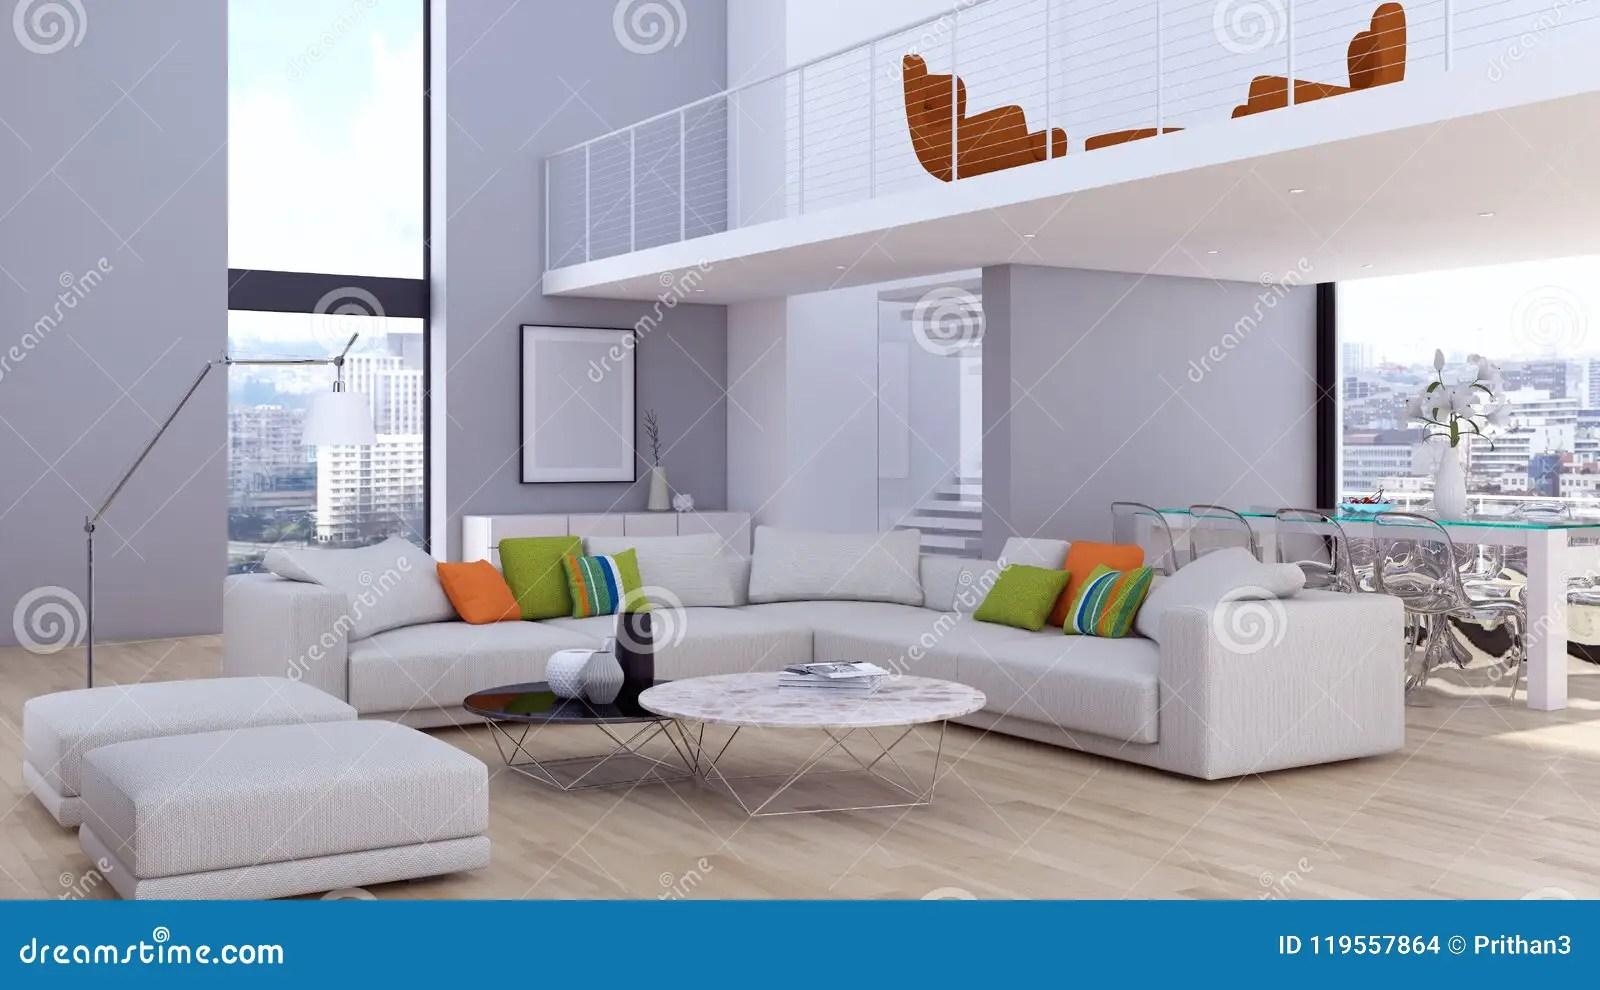 https www dreamstime com large luxury modern bright interiors apartment living room illus large luxury modern bright interiors apartment living room image119557864